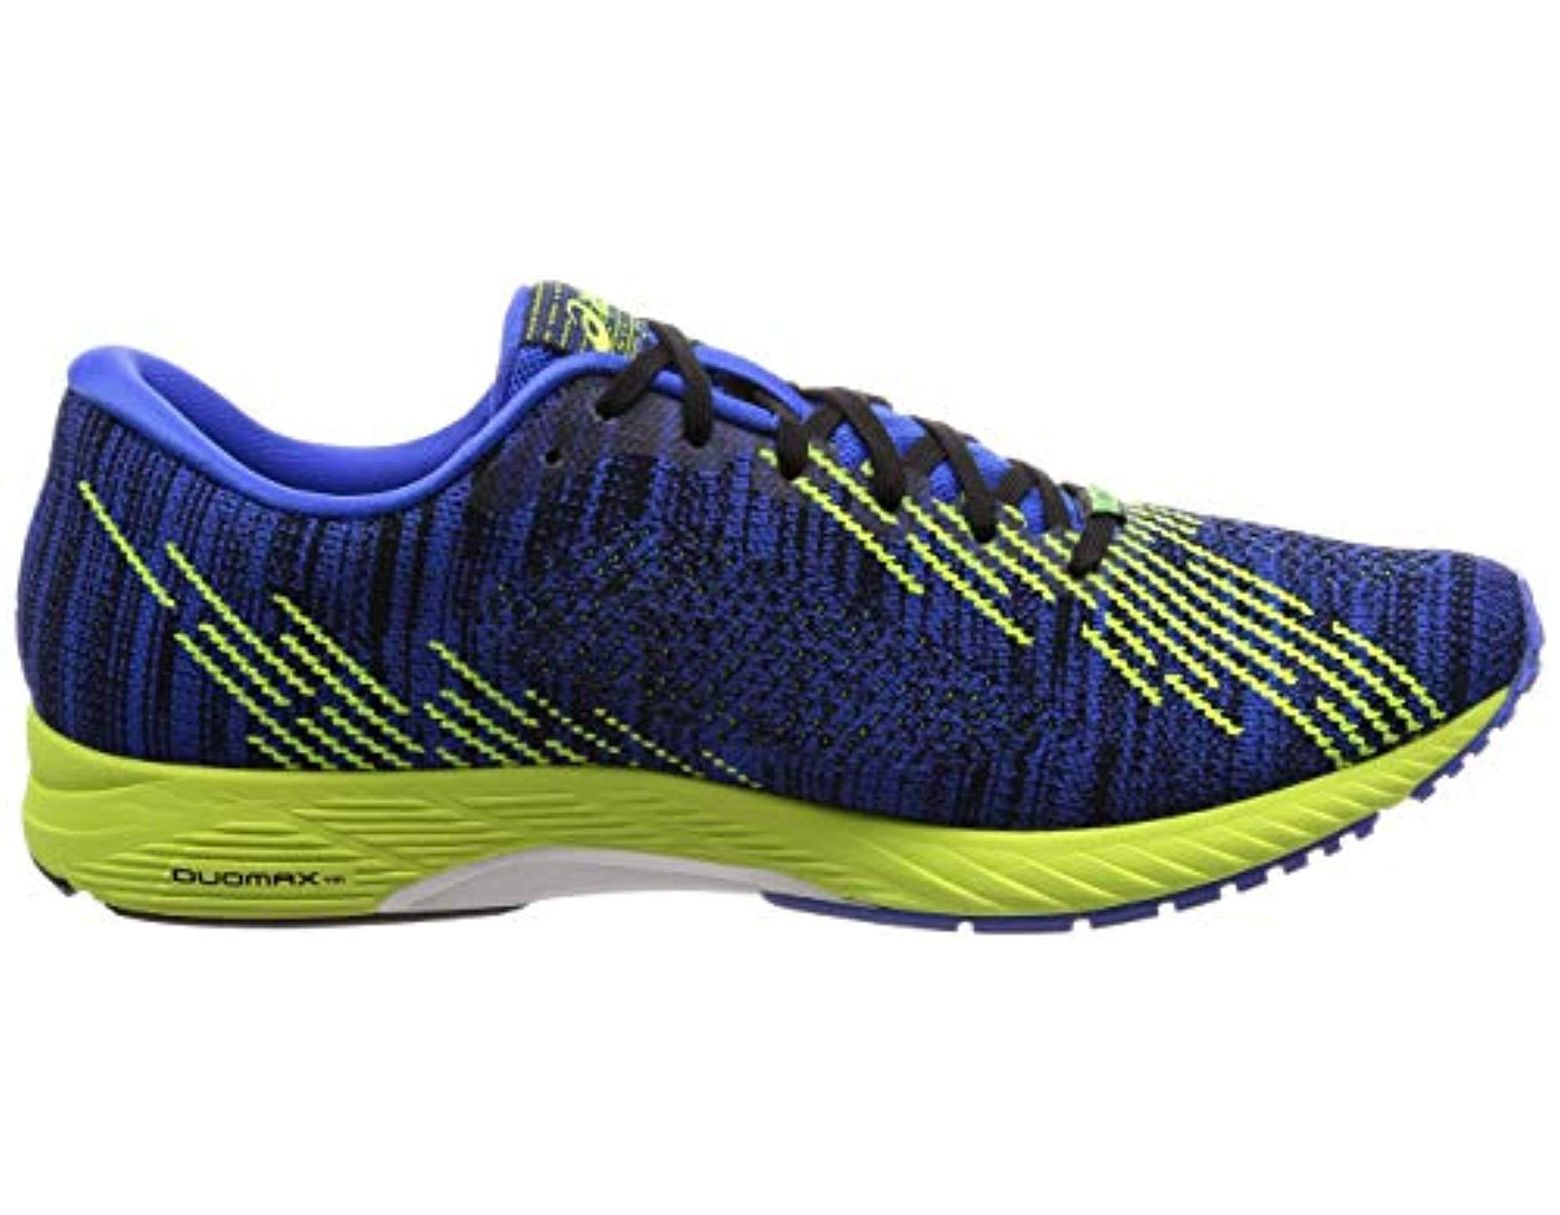 Gel Ds Shoes Running Trainer Blue 24 Men's eHIWED29Y